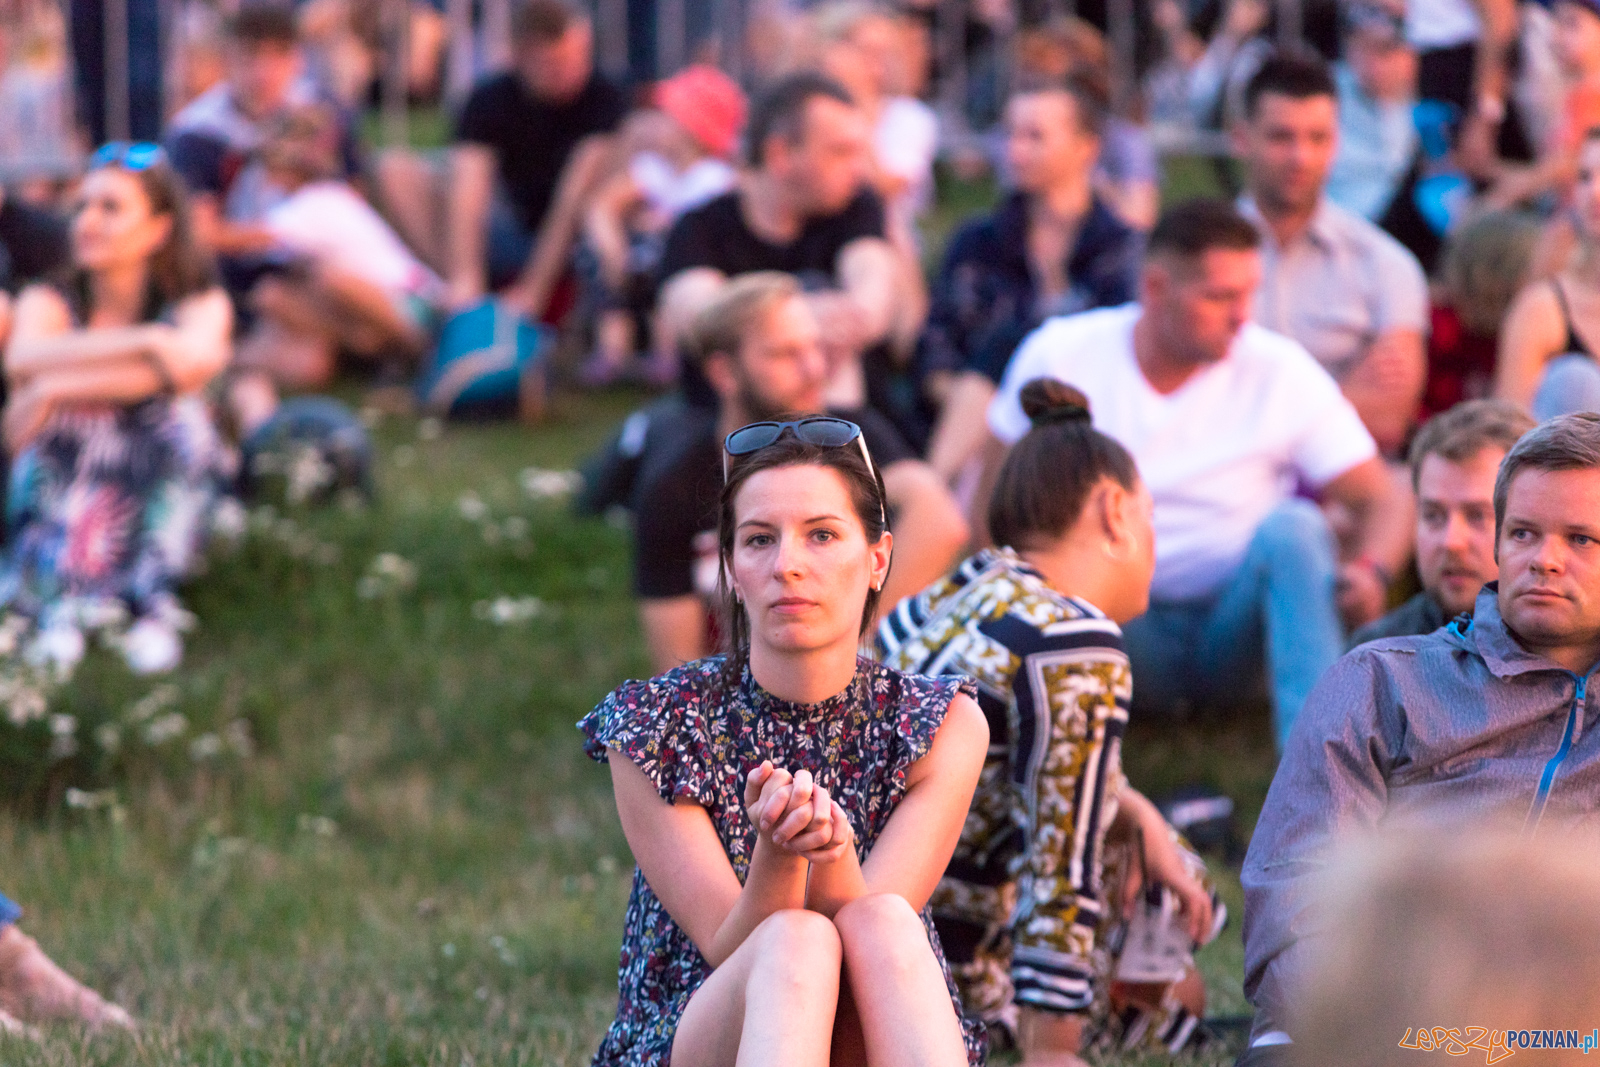 #NaFalach  Foto: lepszyPOZNAN.pl/Piotr Rychter